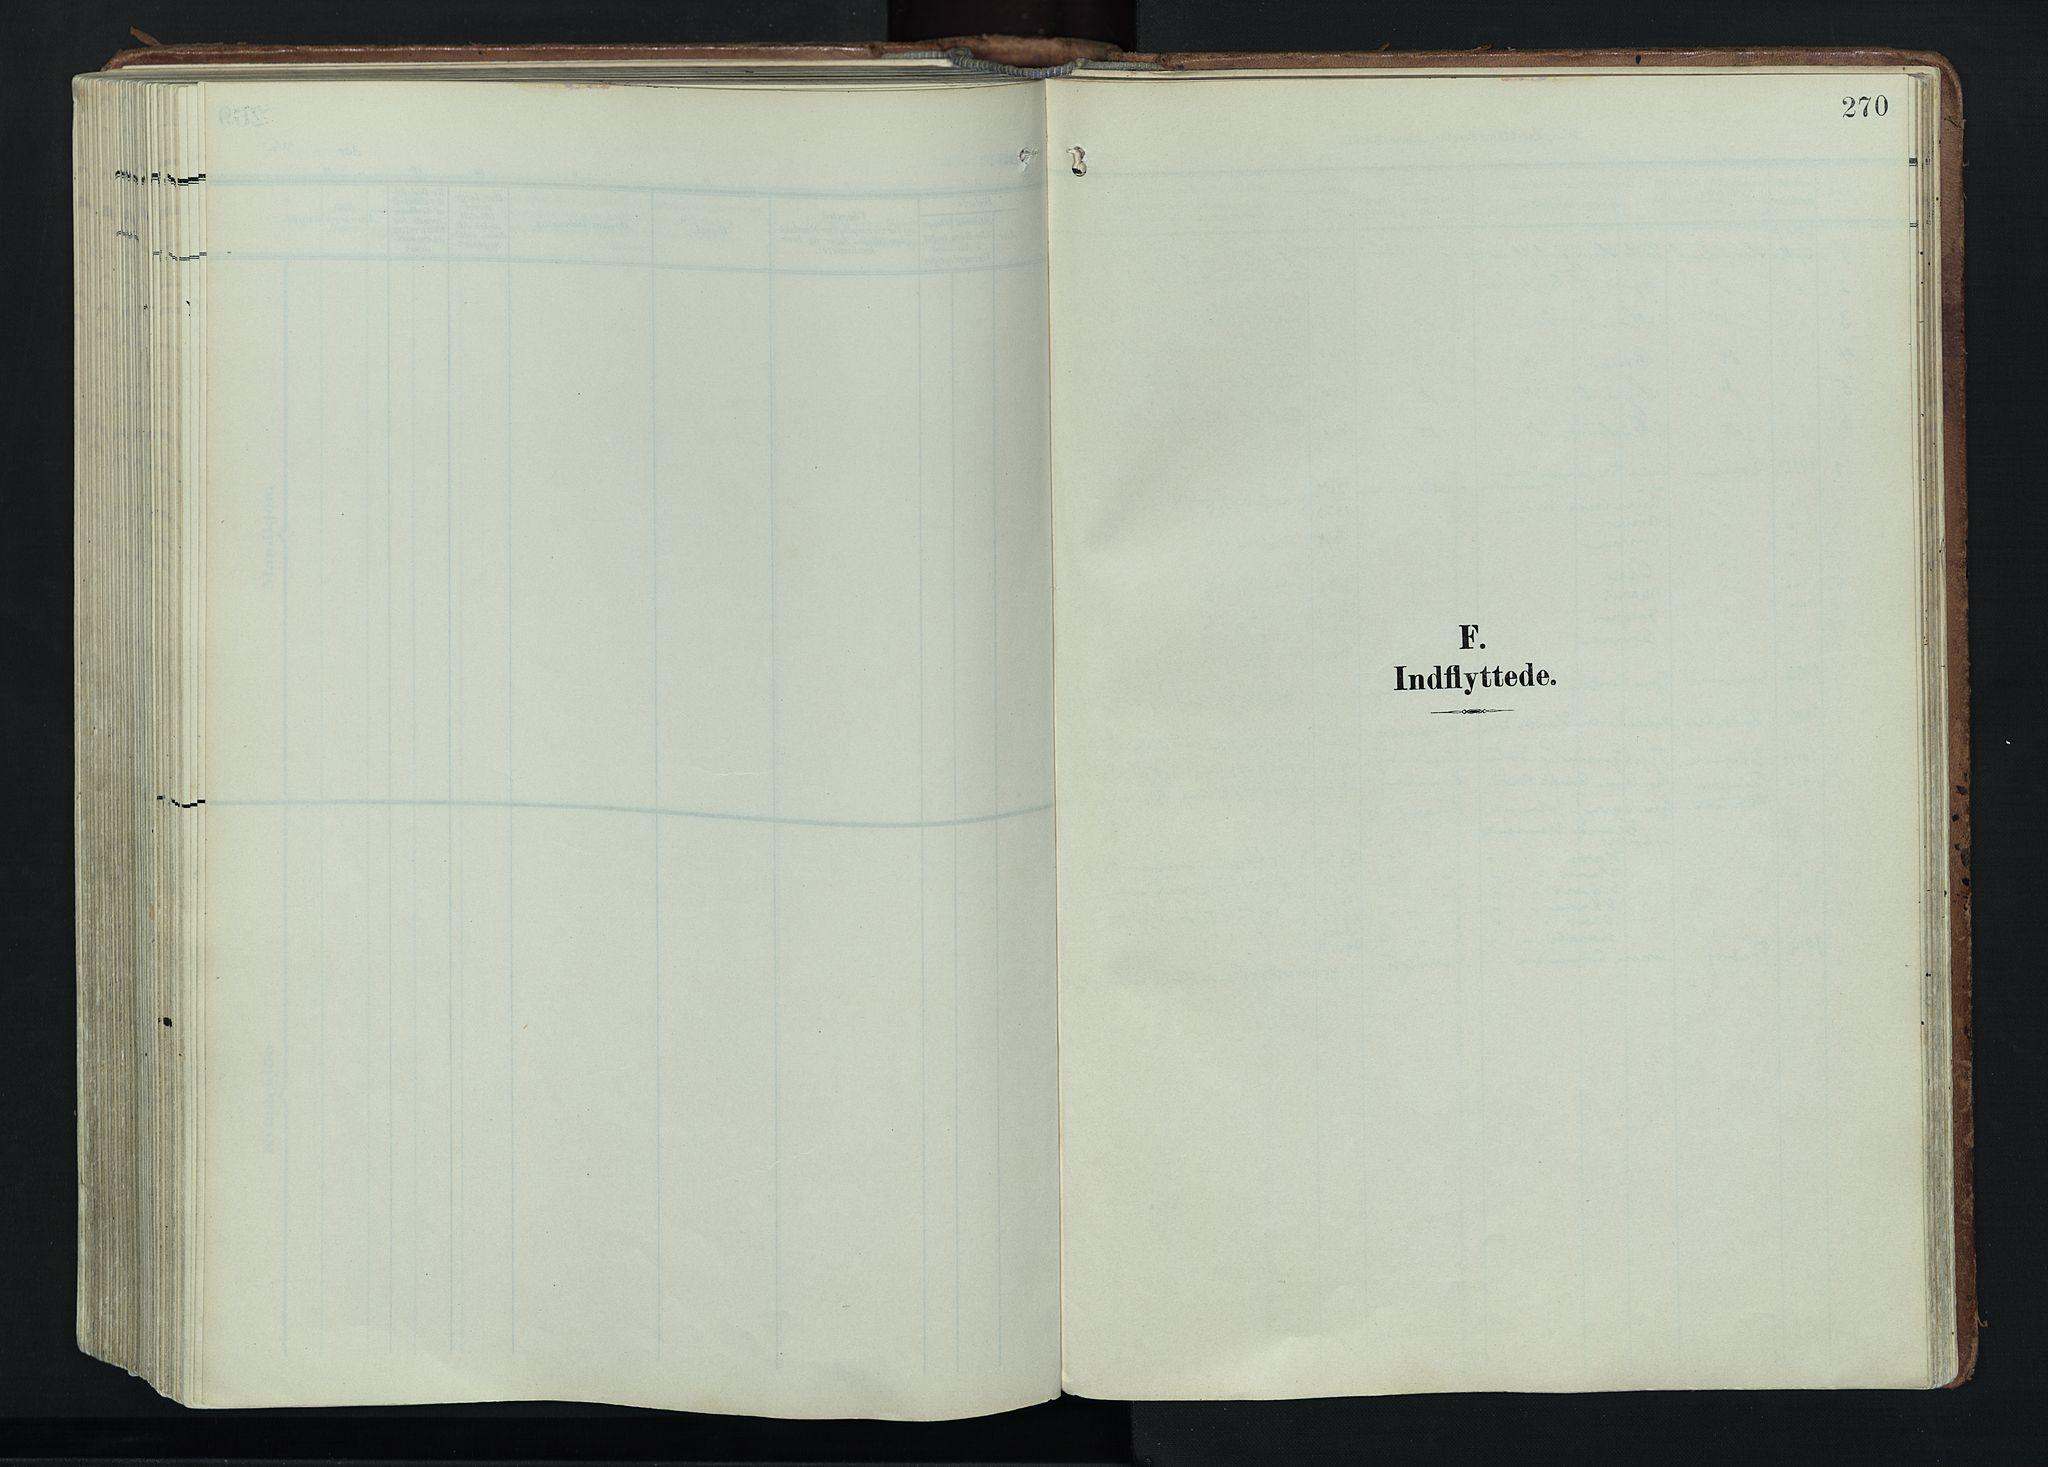 SAH, Vågå prestekontor, Ministerialbok nr. 11, 1905-1924, s. 270